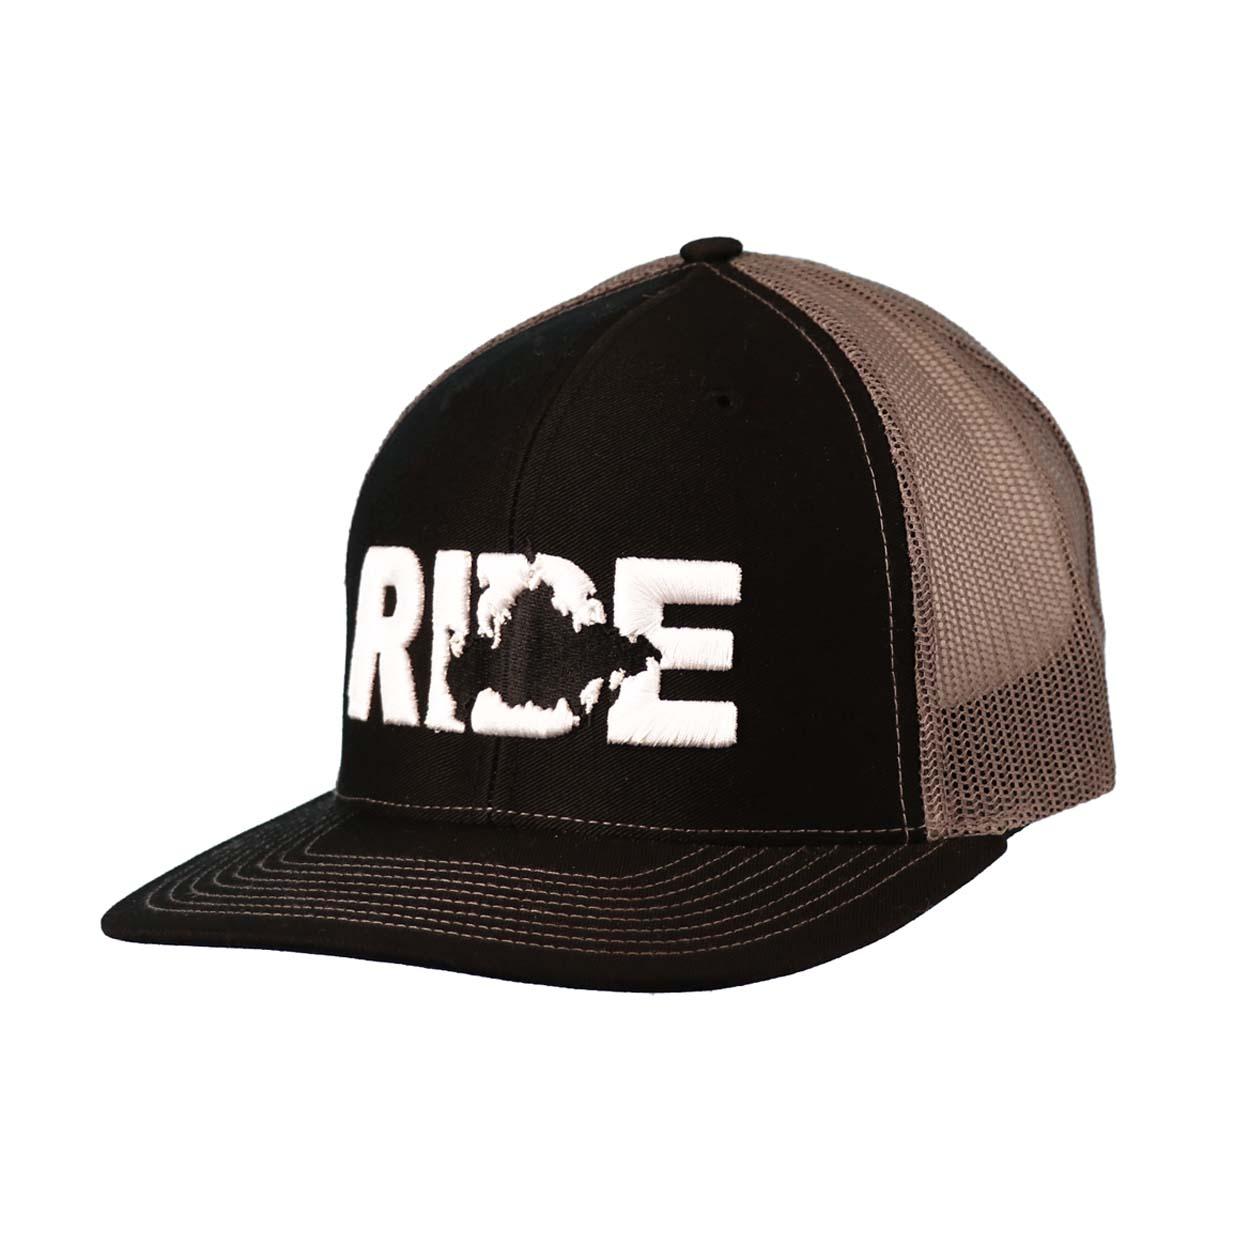 Ride Russia Classic Embroidered Snapback Trucker Hat Black/White